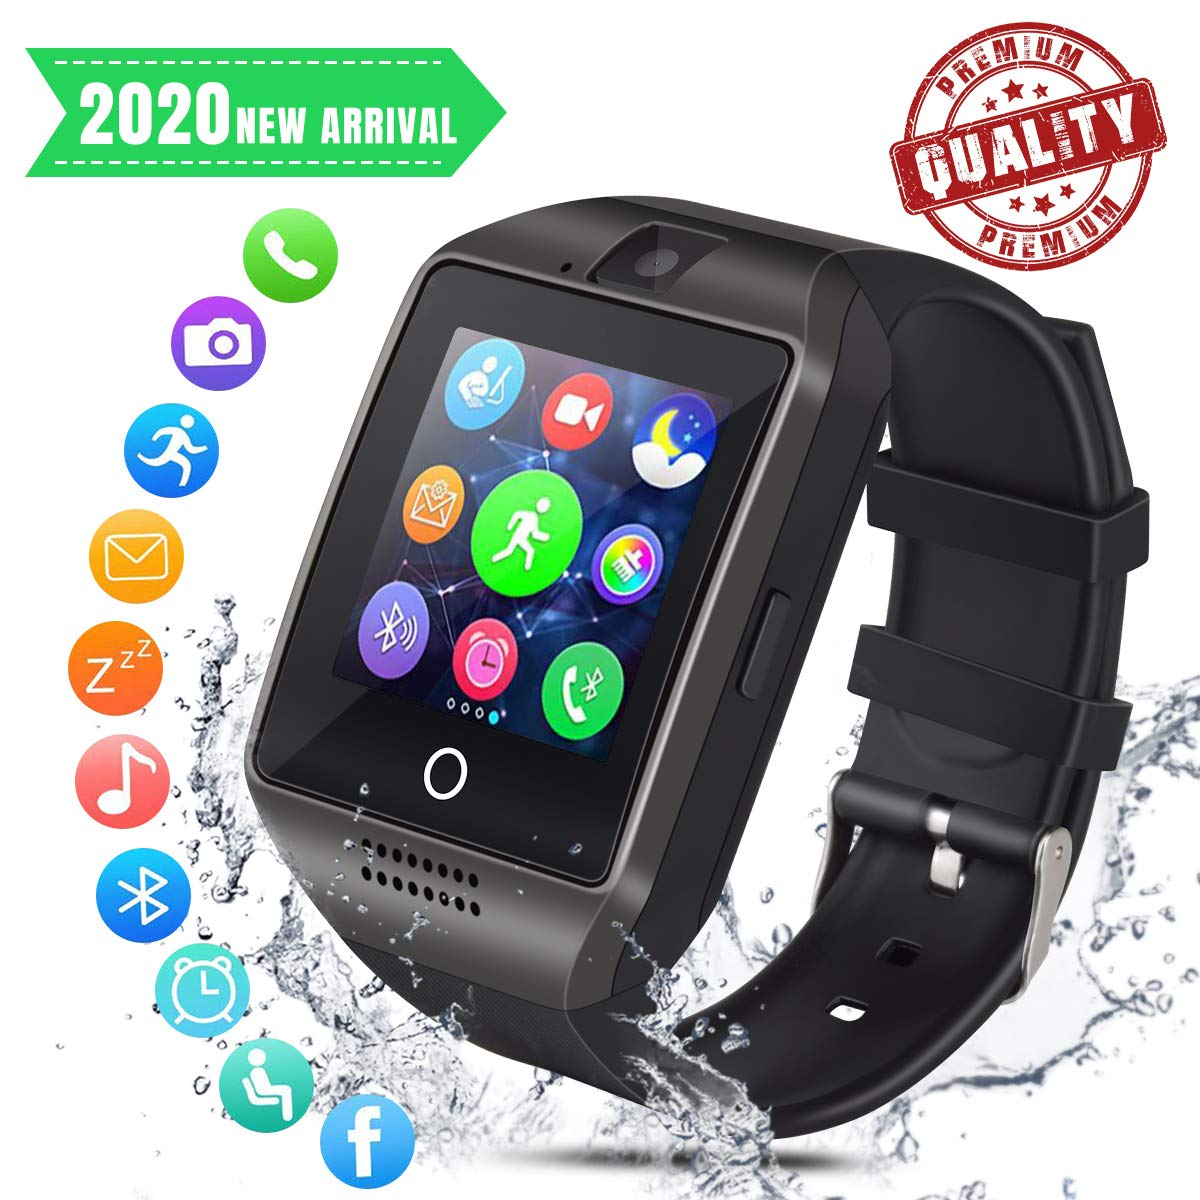 Smartwatch Bluetooth Hombre Reloj Inteligente con Whatsapp Smartwatches con Cámara Pantalla Táctil para Tarjeta SIM Smart Watch Telefono Sport ...